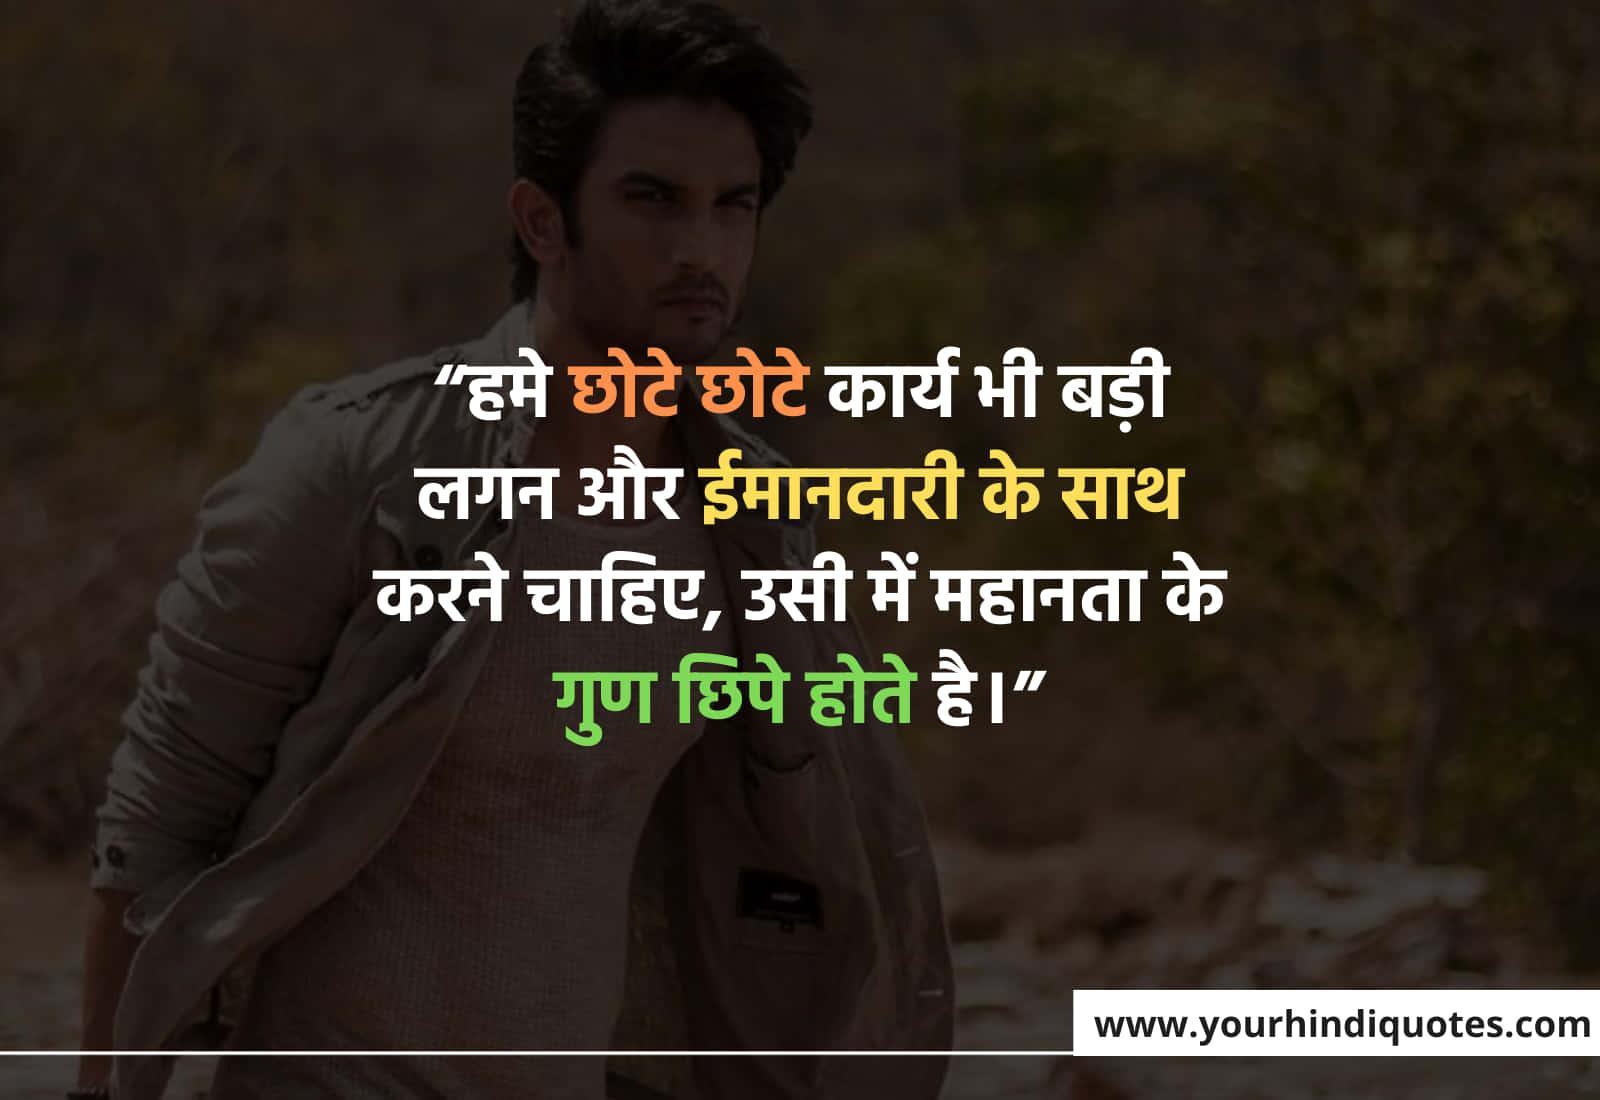 Inspiring Life Thoughts In Hindi